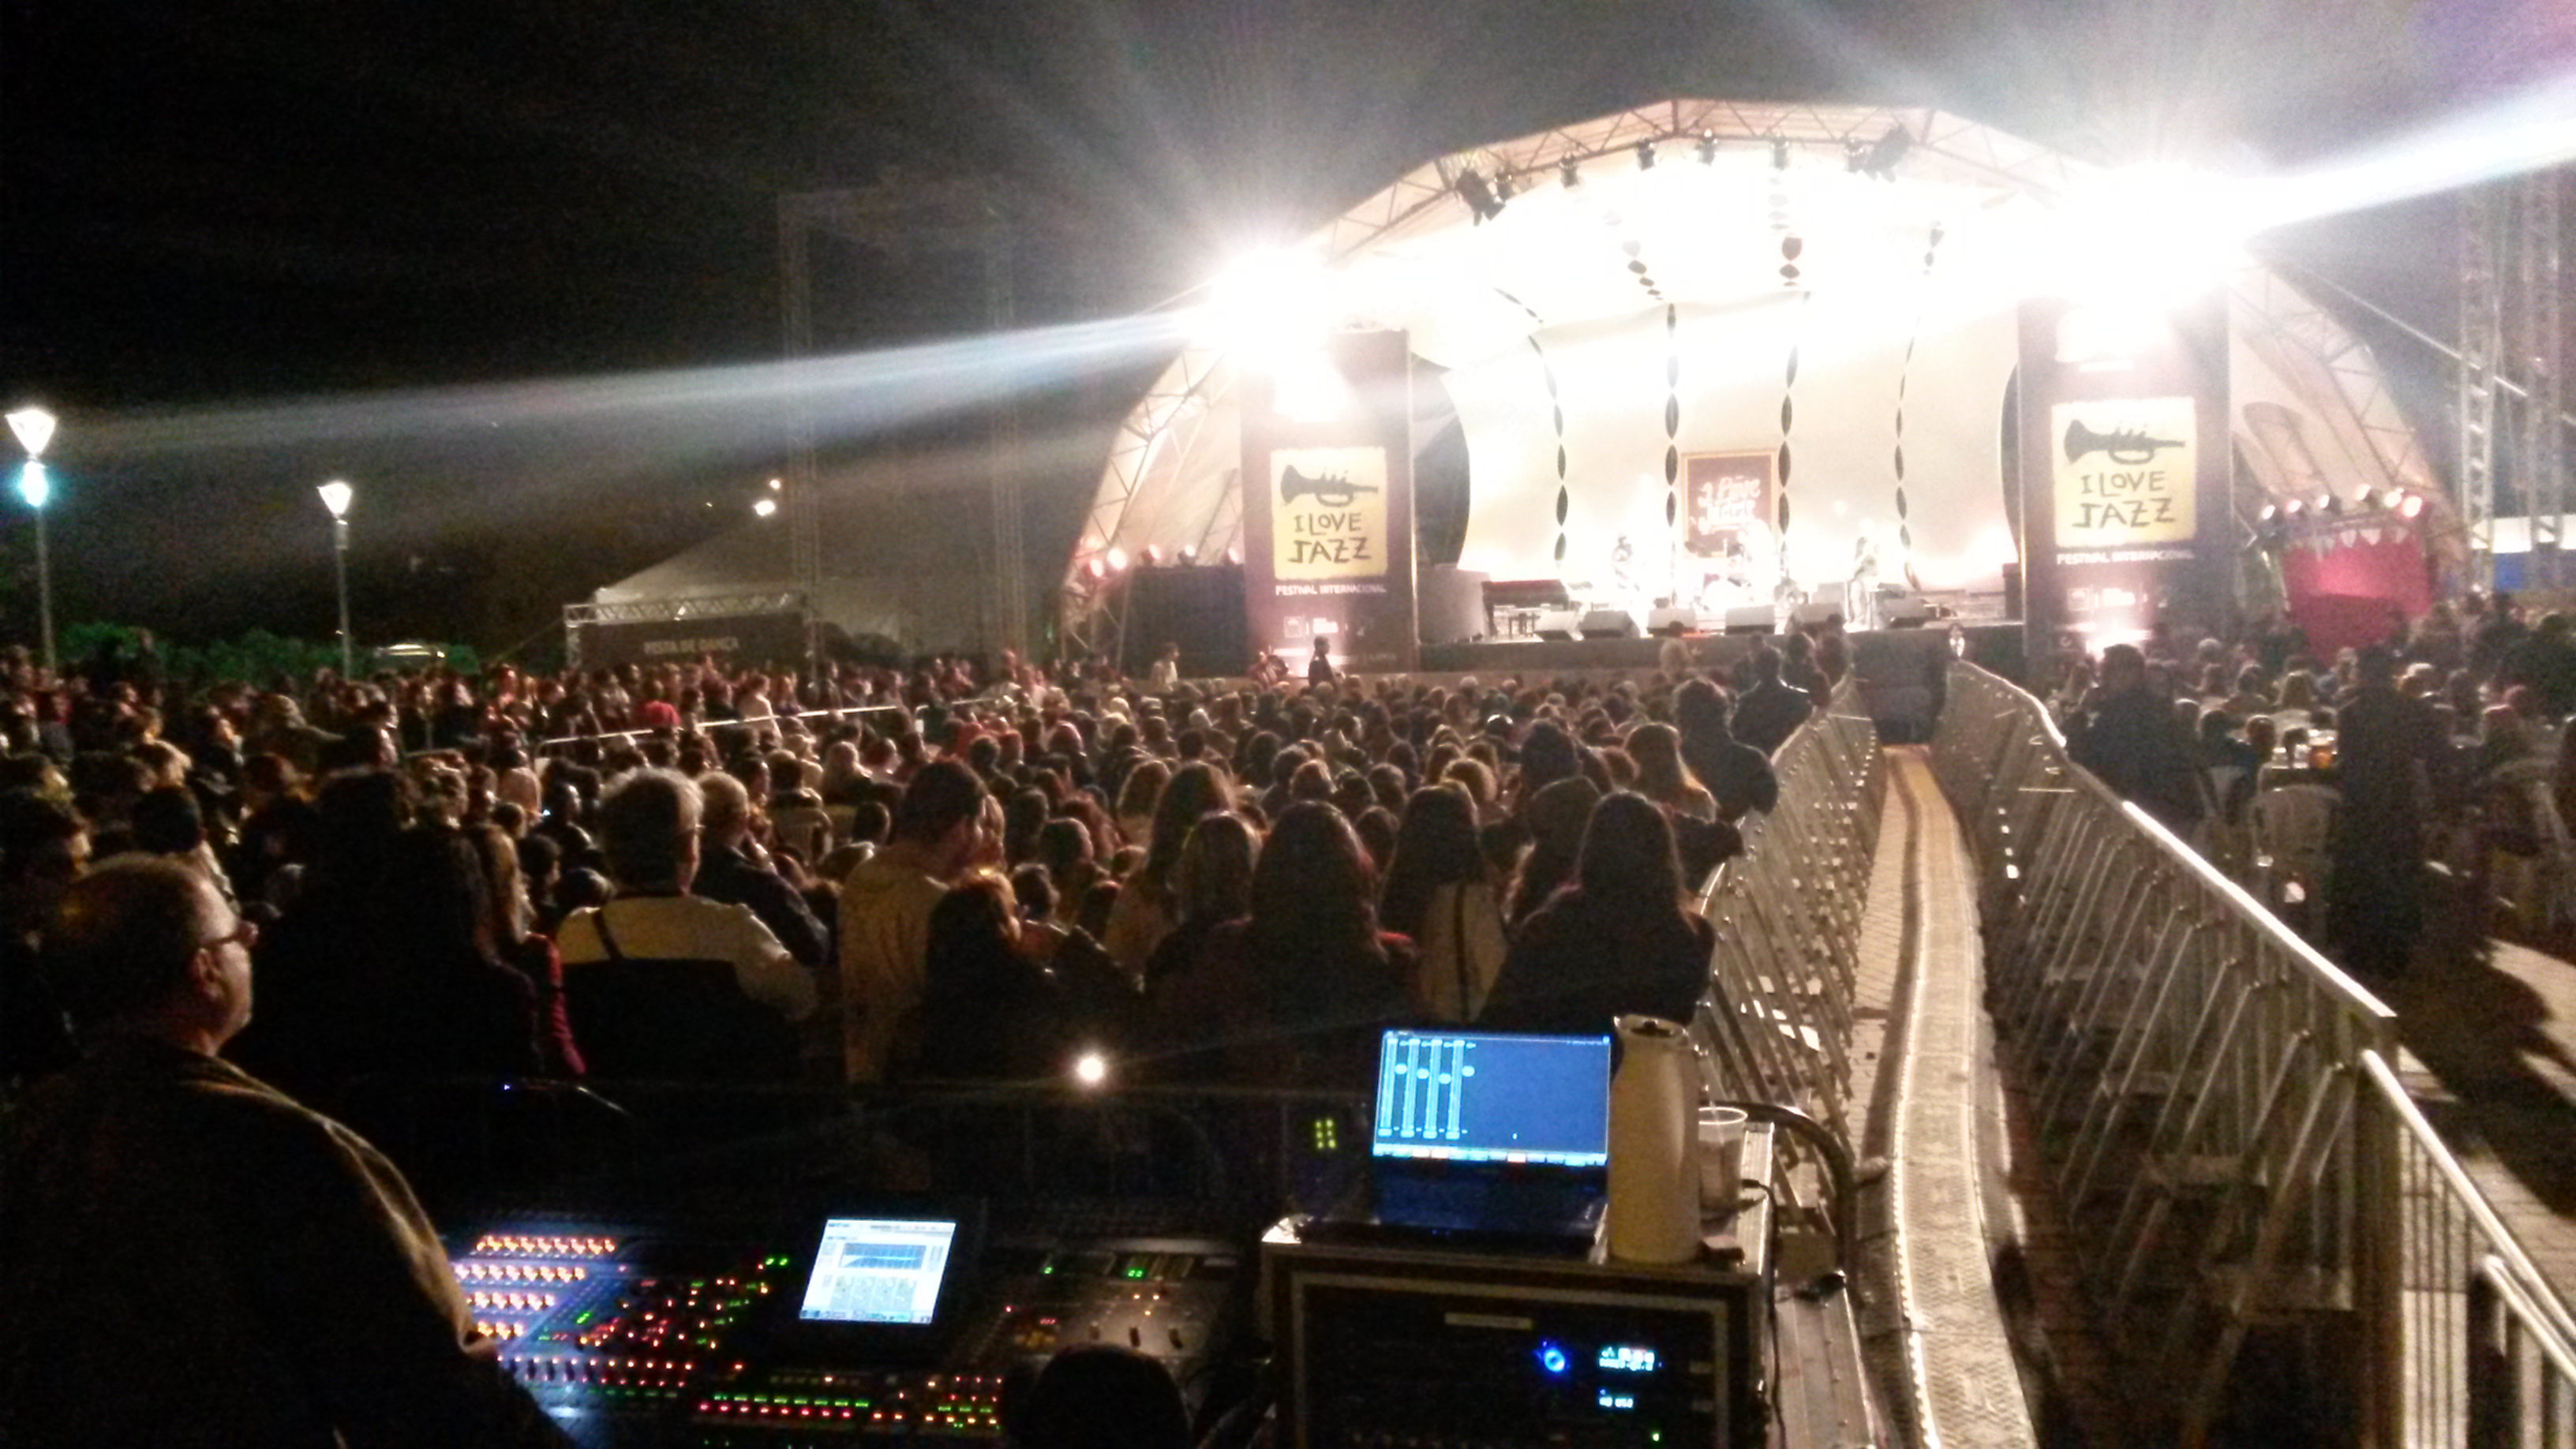 FESTIVAL I LOVE JAZZ 2014